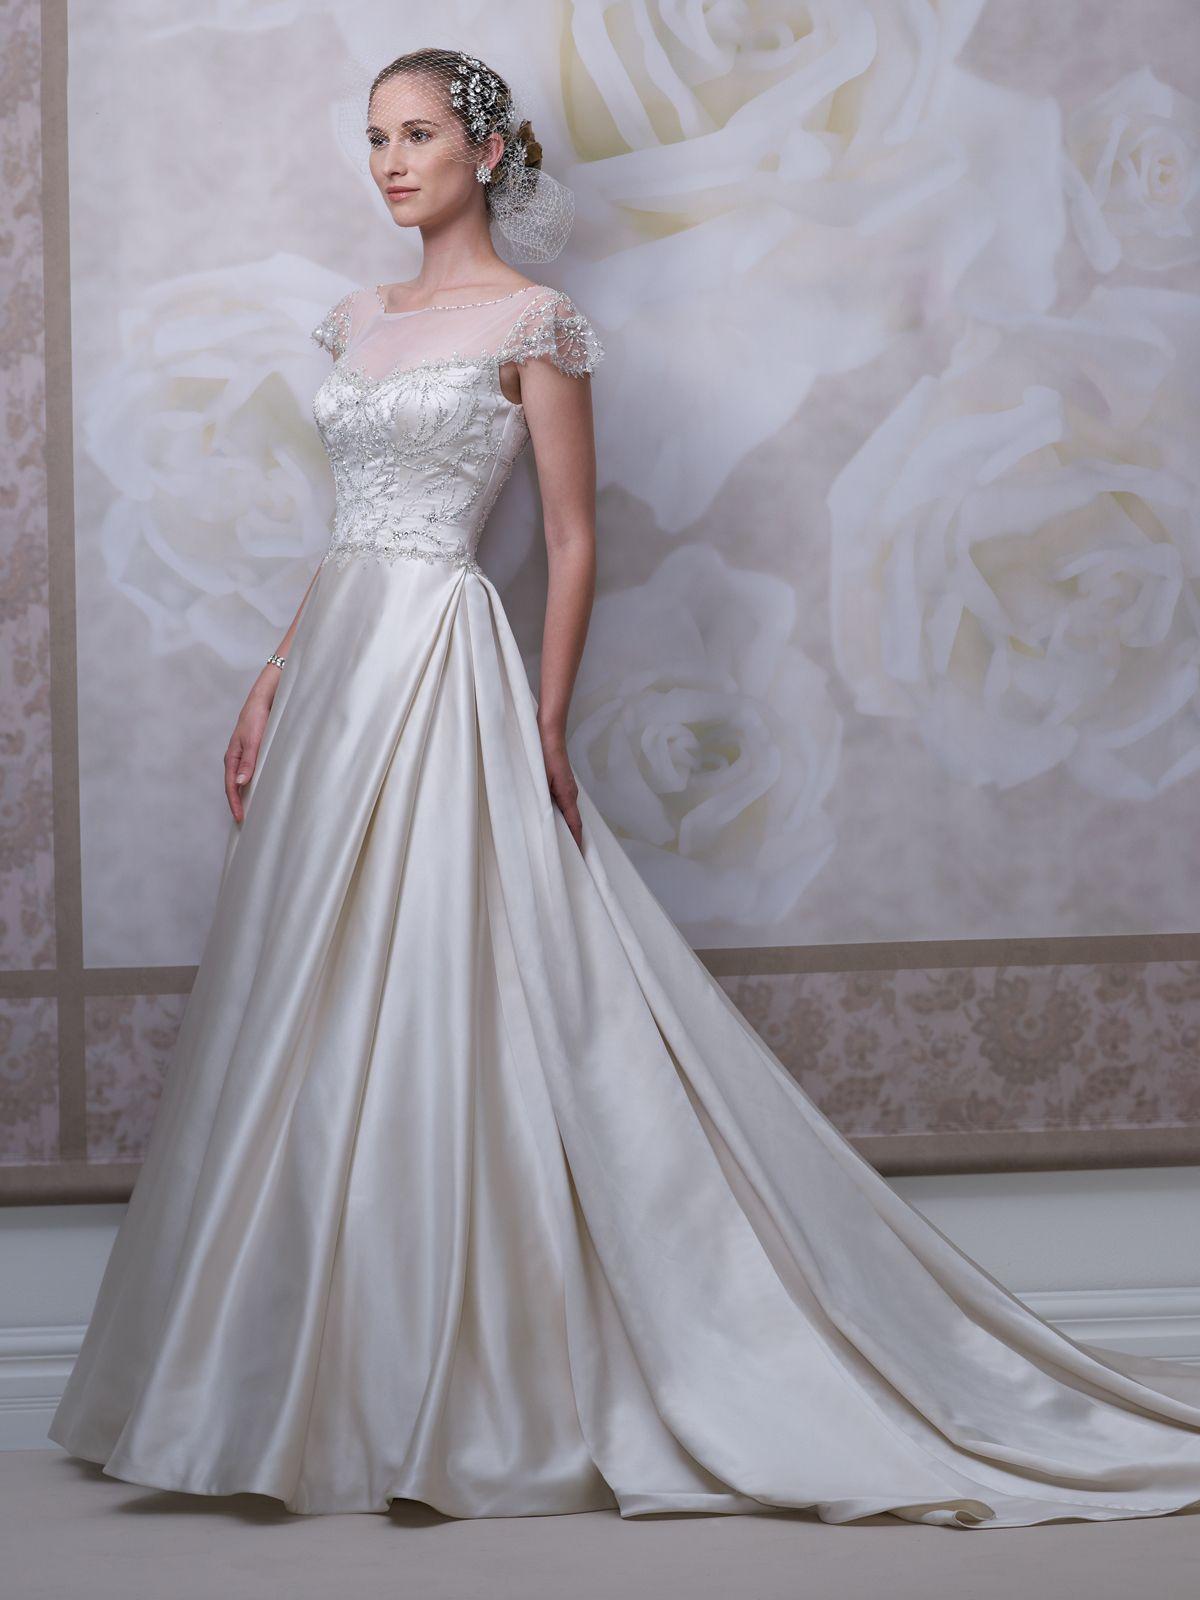 James clifford style no ua j wedding dresses